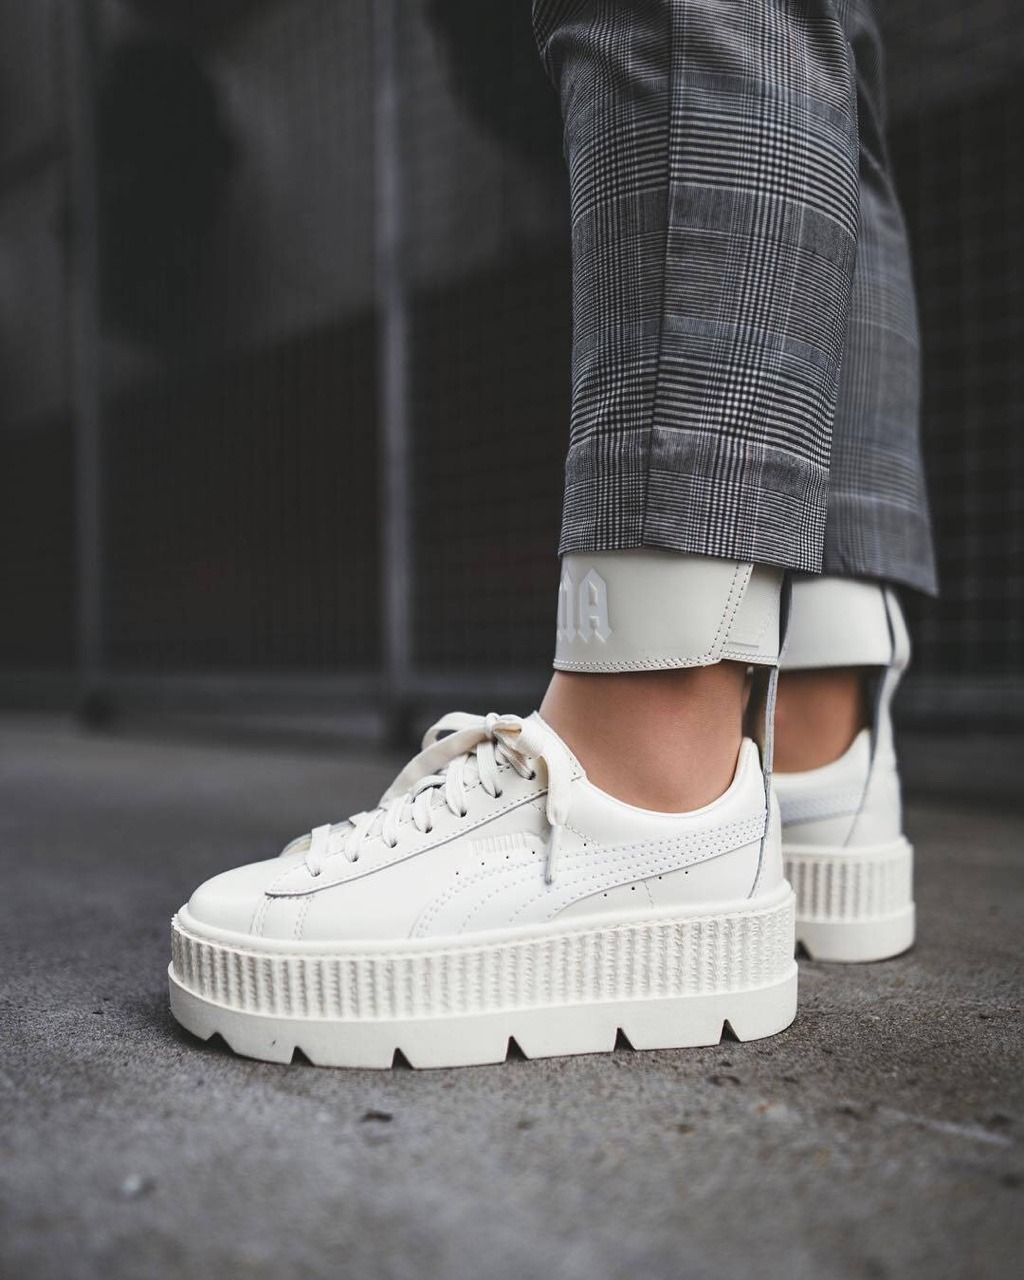 Puma fenty shoes, Sneaker boots